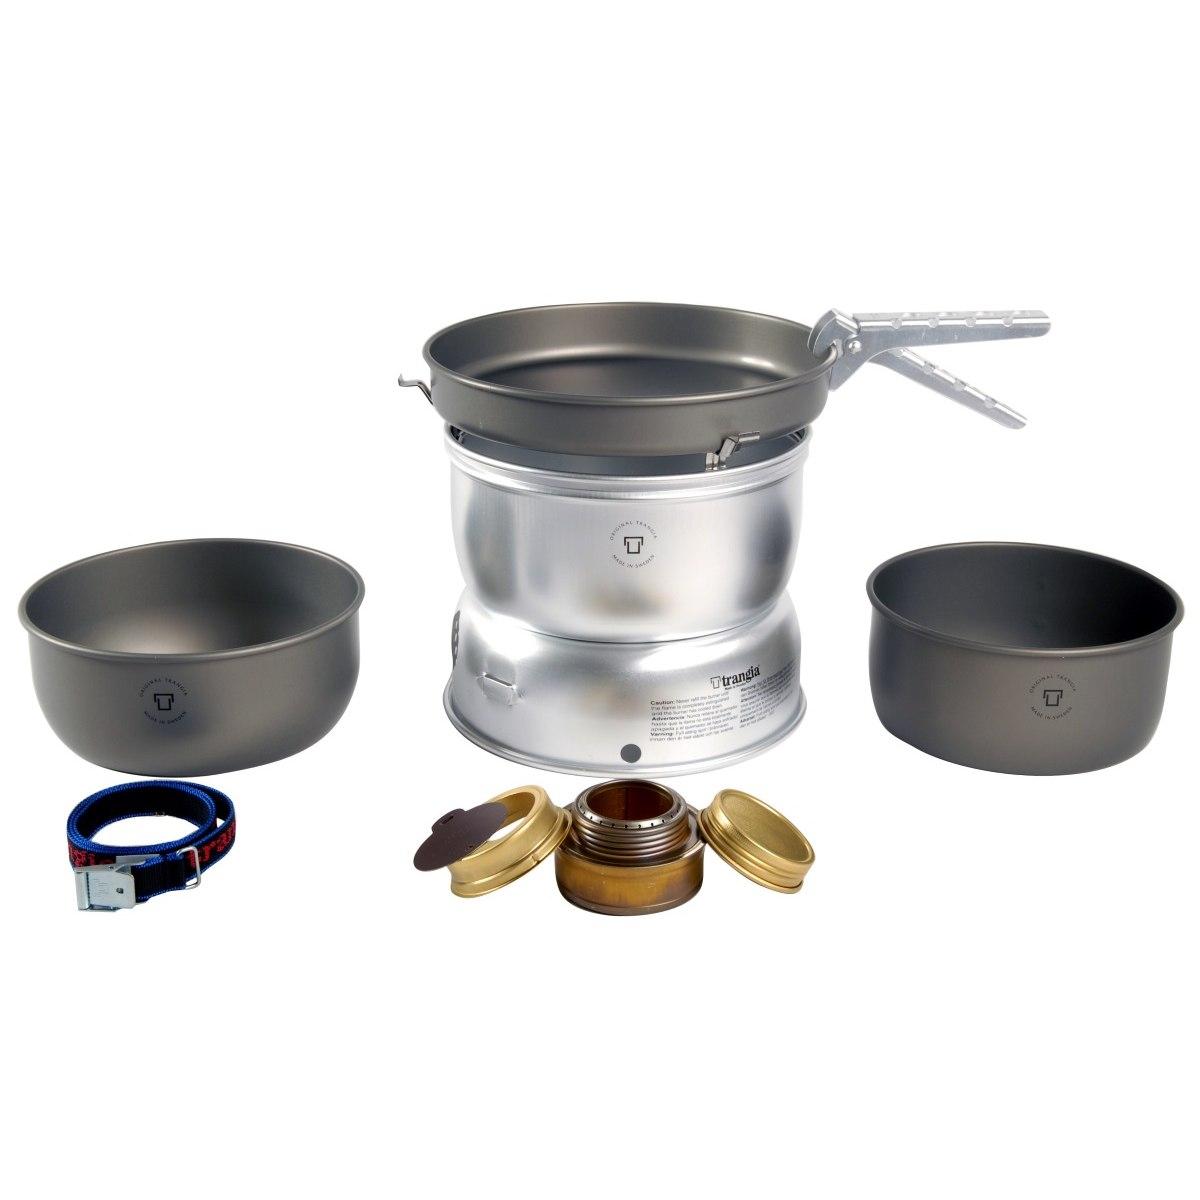 Trangia Storm Cooker 25-7 UL/HA - Stove System